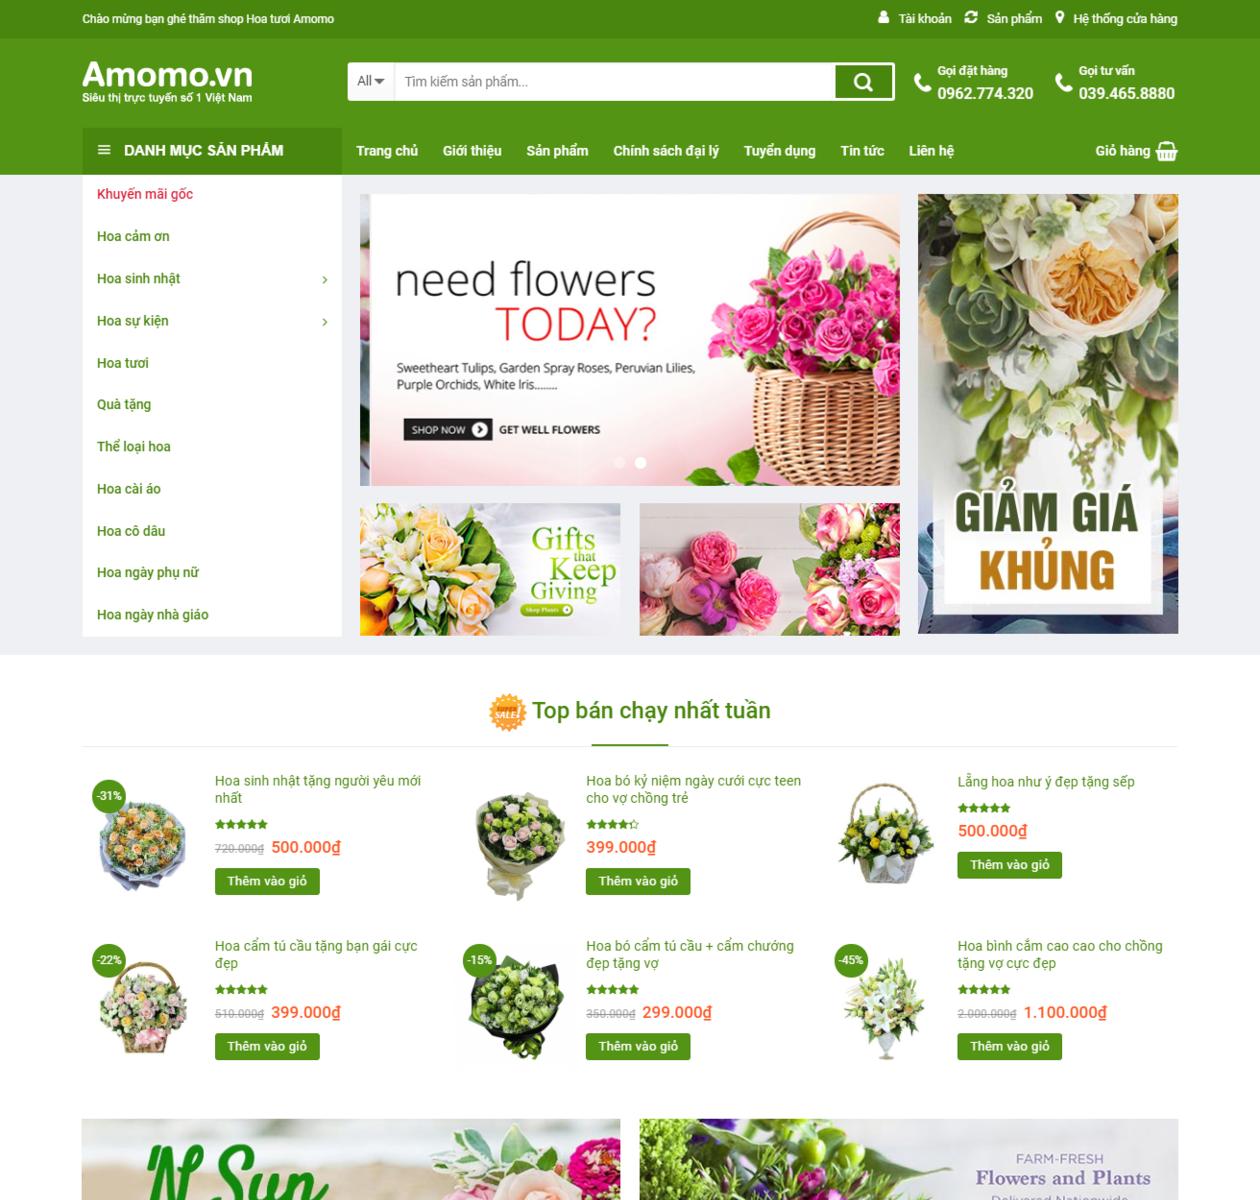 Mẫu web bán hoa cực đẹp thumbnail